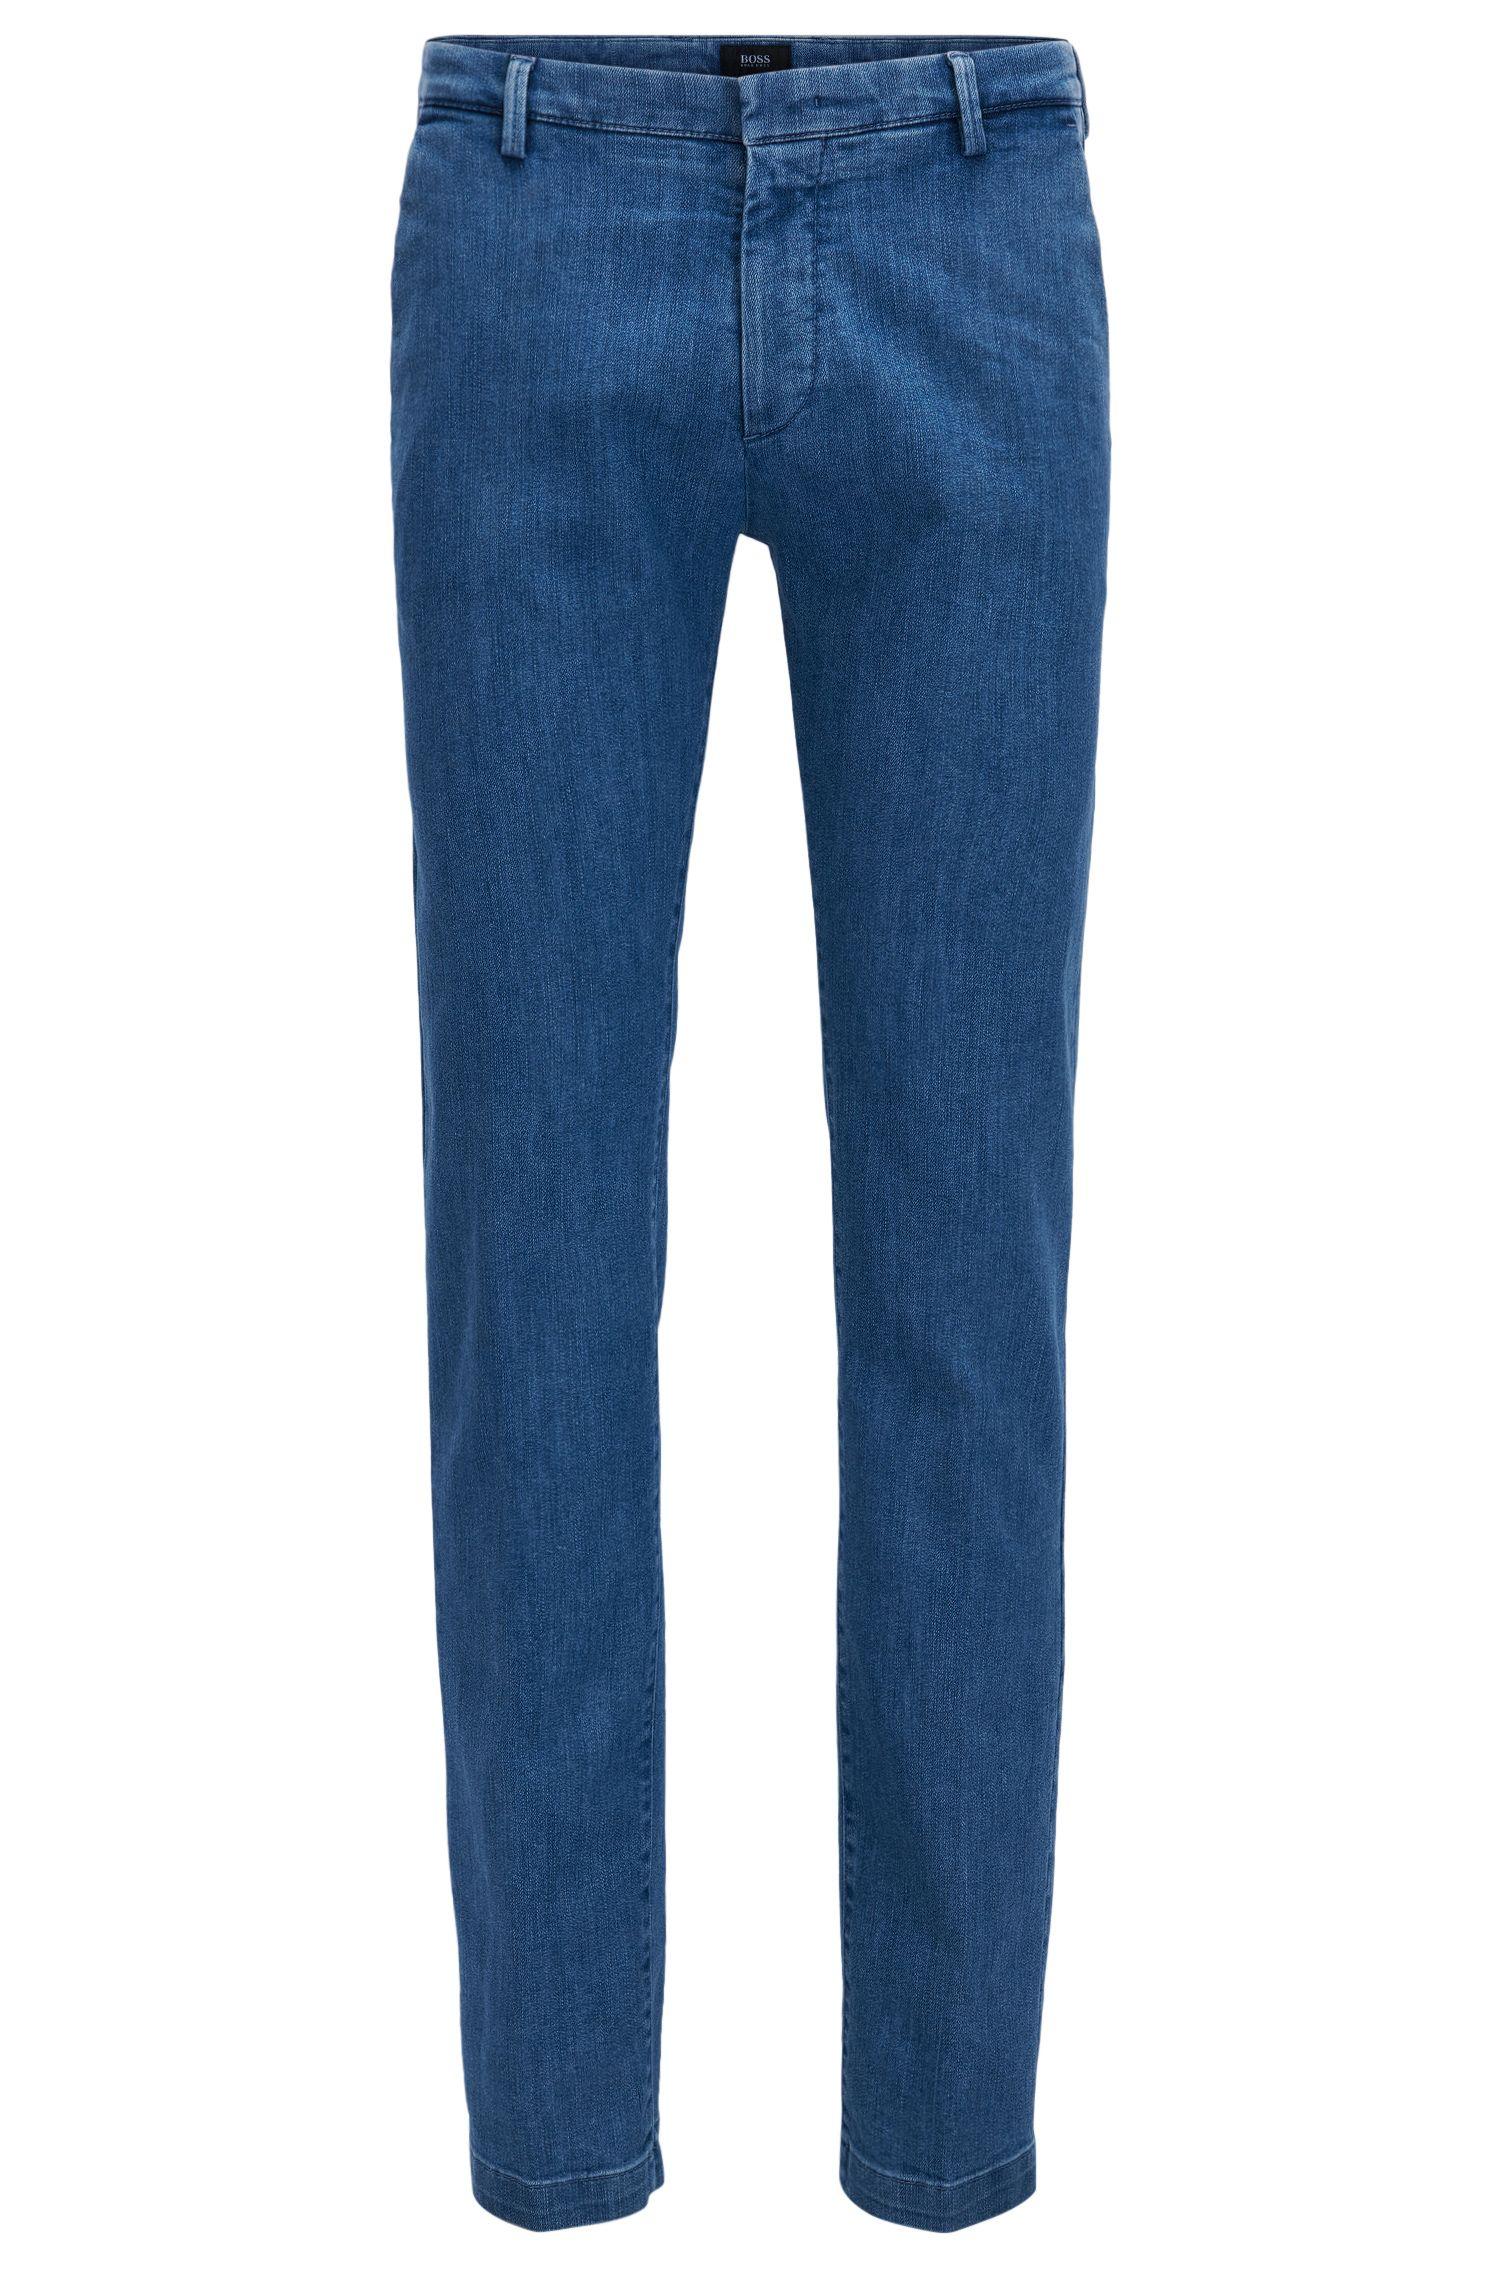 Italian Cotton Blend Denim Pant, Slim Fit | Rice W